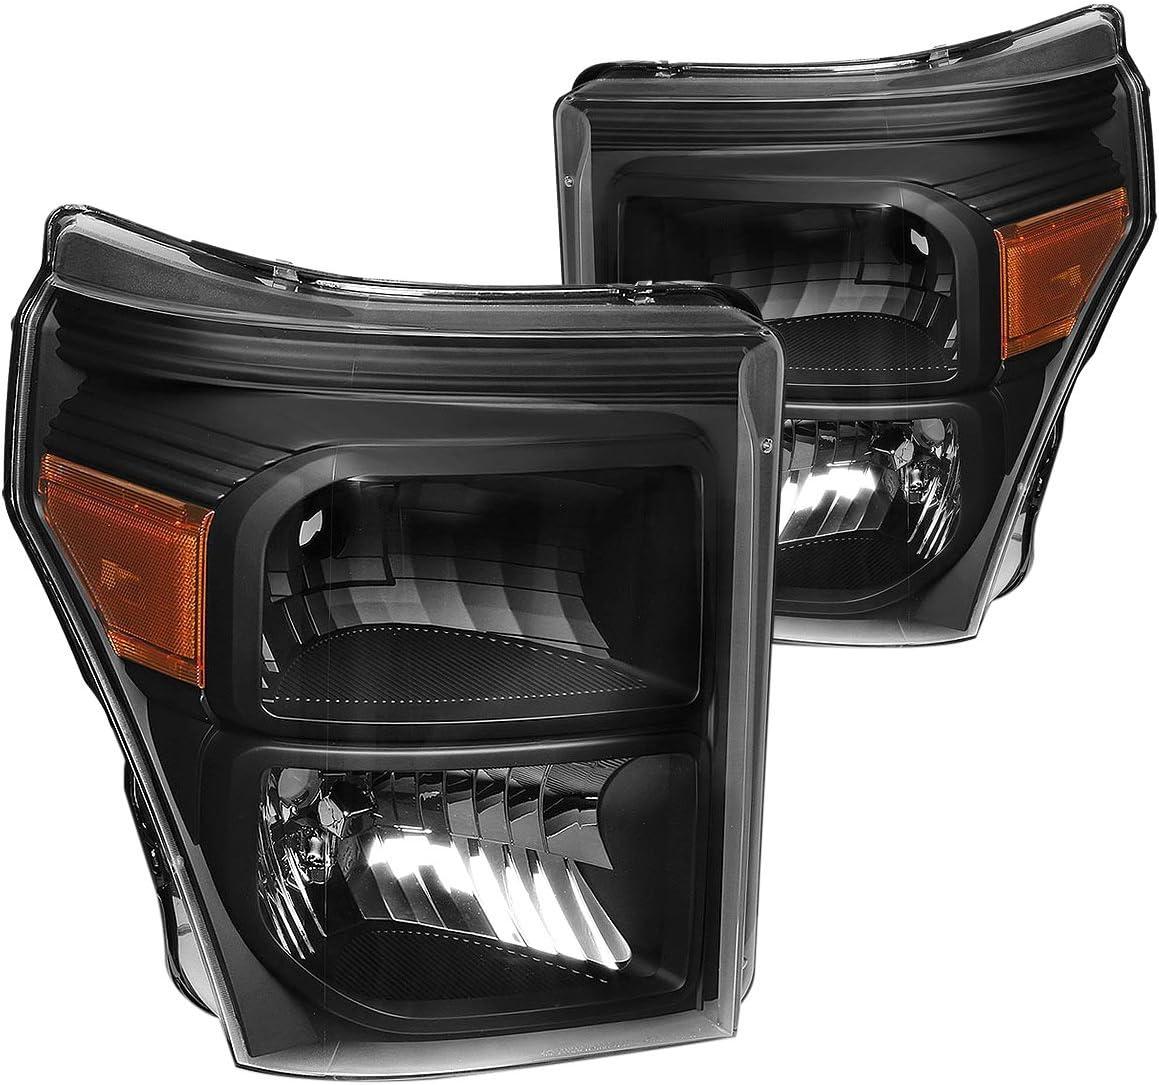 Driver and Passenger Side,Black Housing DNA MOTORING HL-OH-FSU13-BK-AM Headlight Assembly Amber Corner